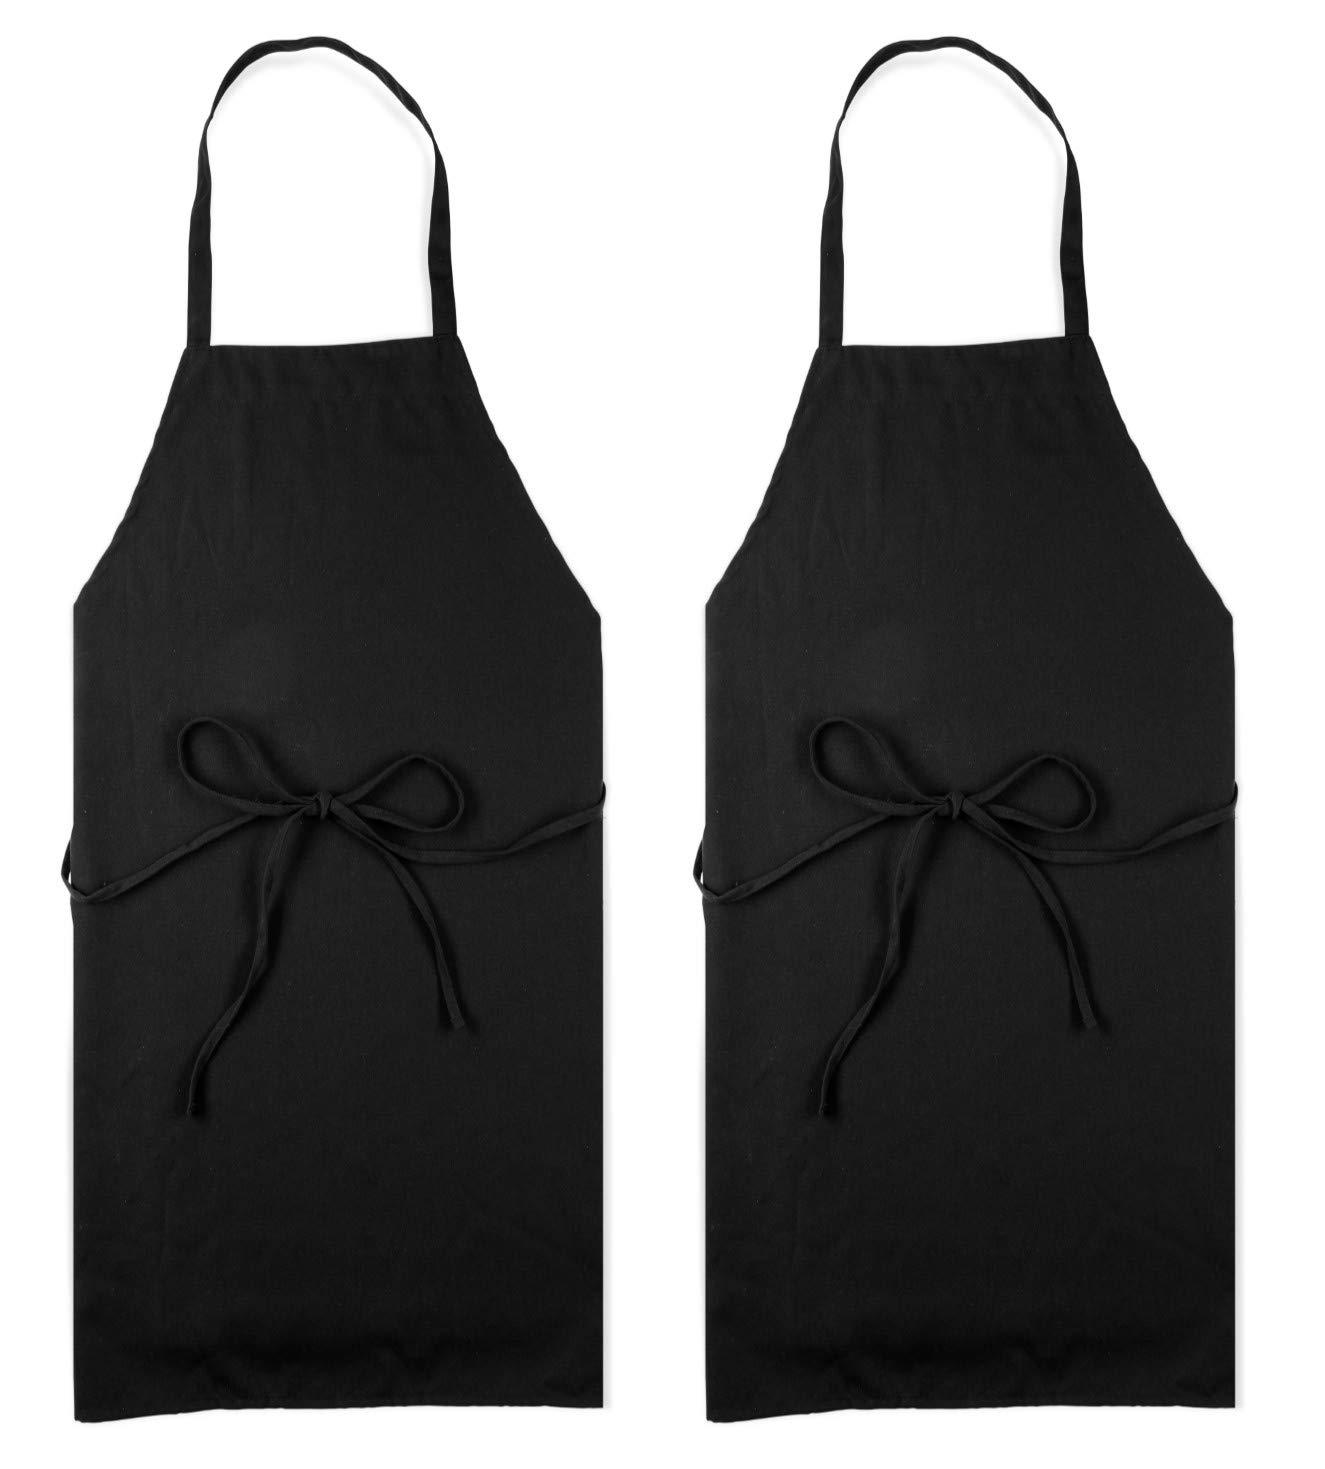 Professional Black Bib Aprons for Restaurant - Set of 2 Durable Adult Waitress Chef Kitchen Apron for women & men (2 Pack - Black)